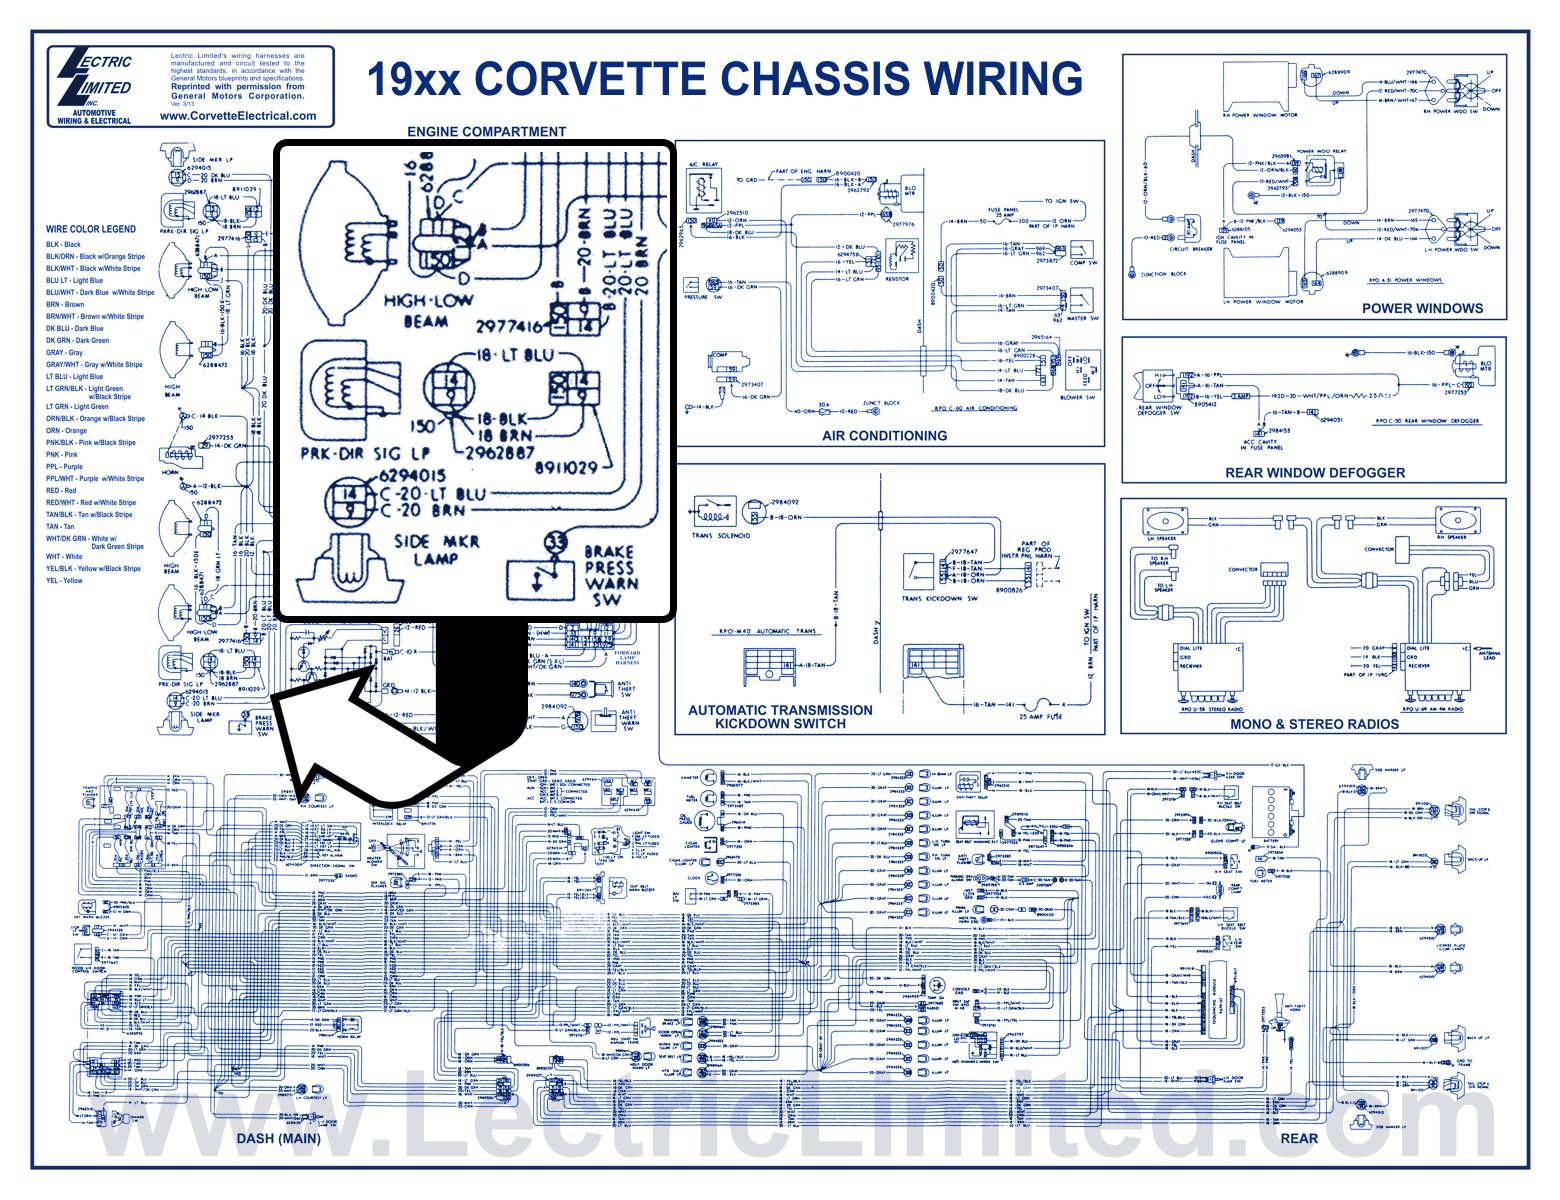 1979 corvette wiring diagram awesome wiring diagram image rh mainetreasurechest com 1979 corvette wiring diagram free 1979 corvette wiring diagram dome lamps